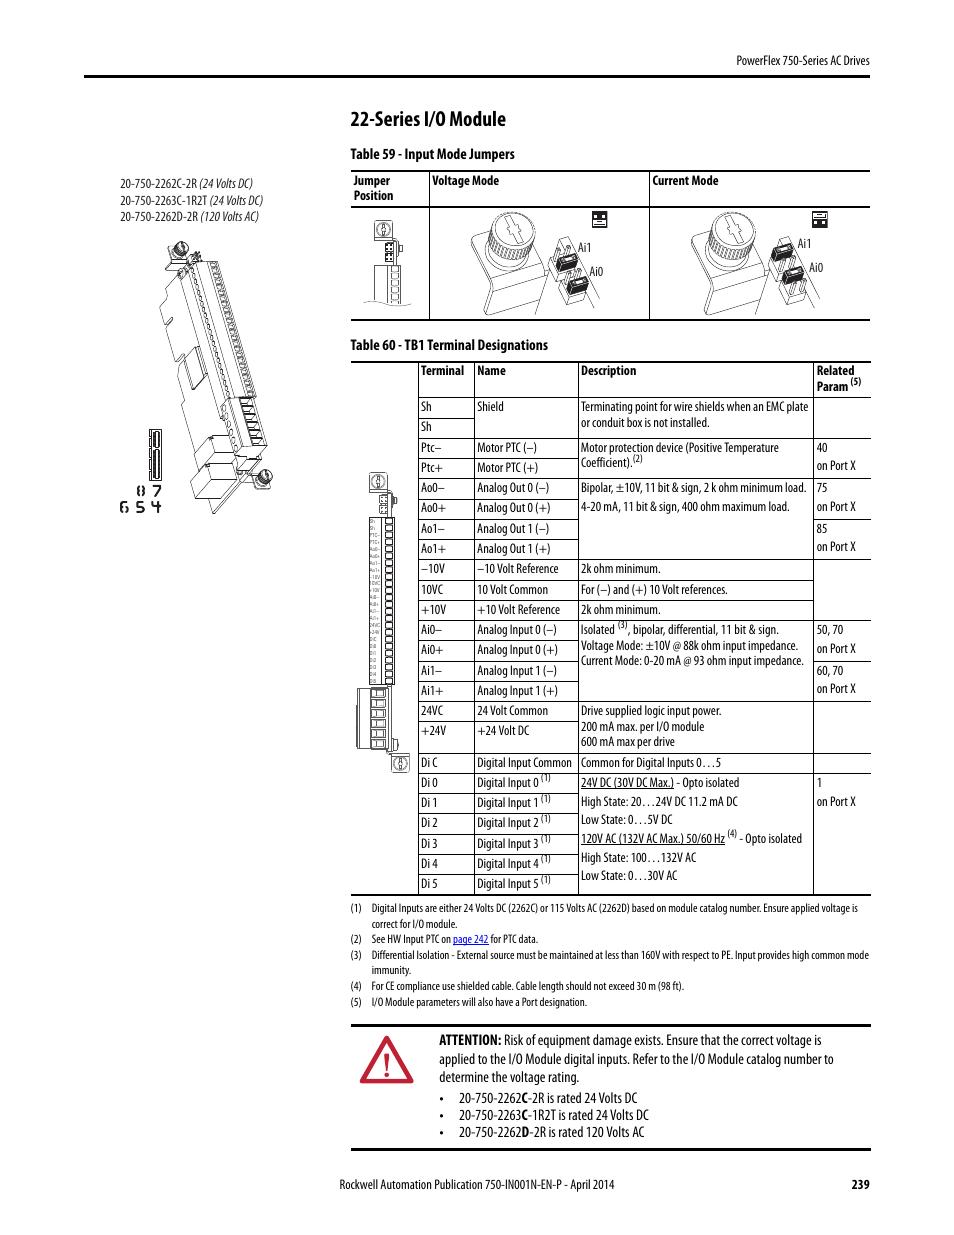 terex hd1000 wiring diagram